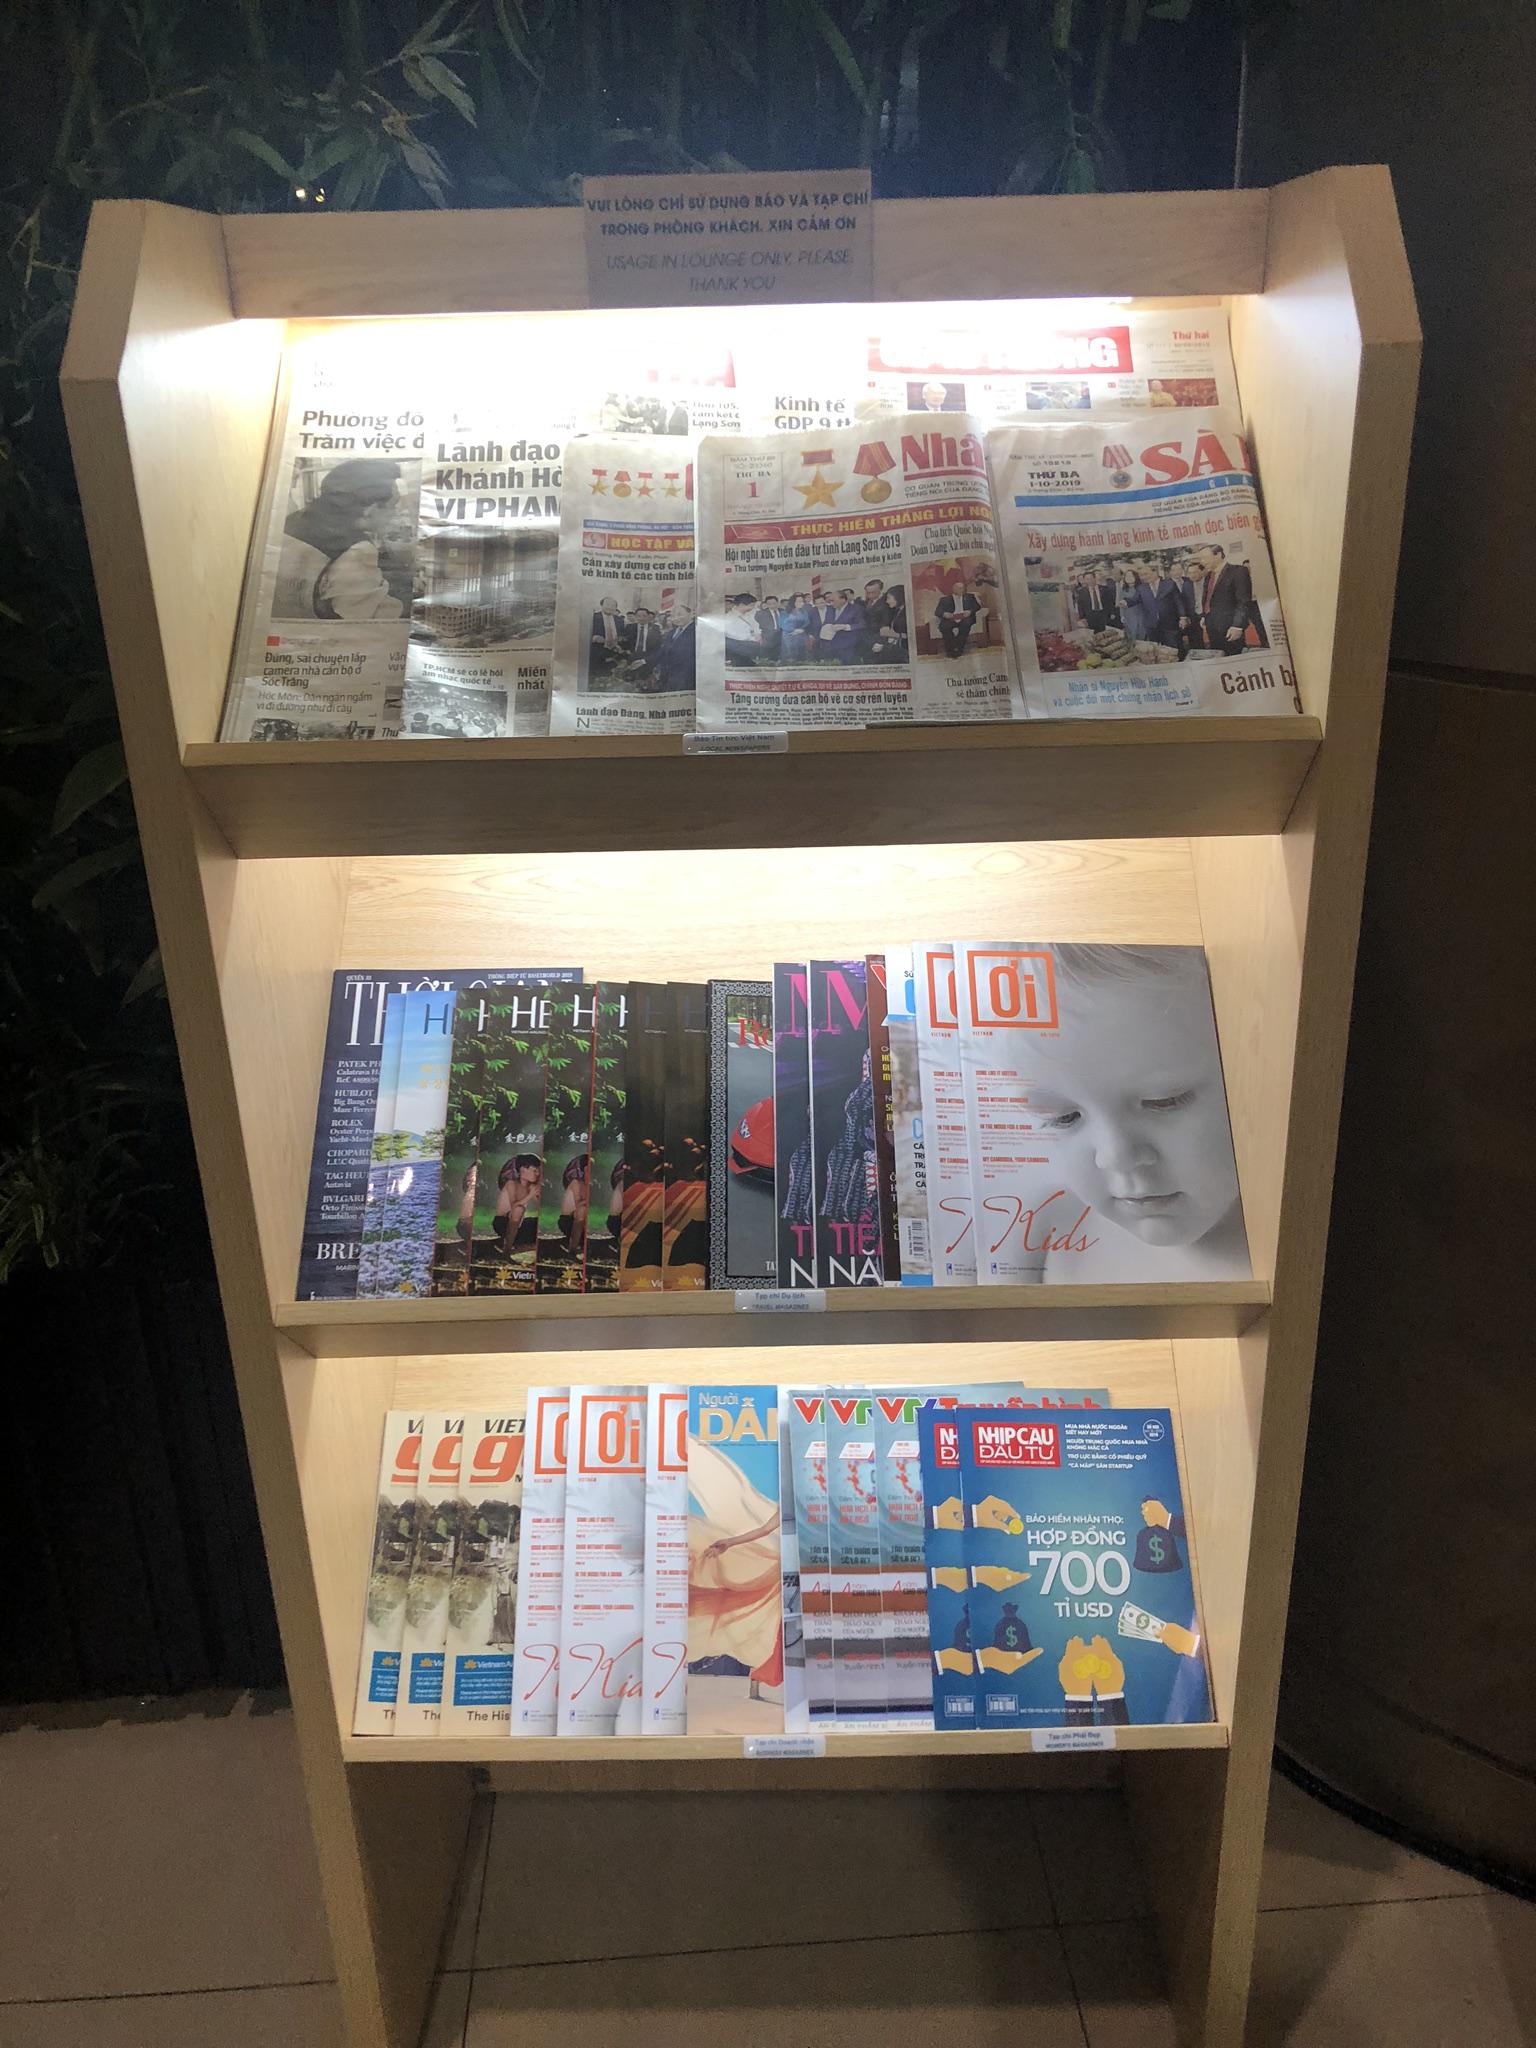 Vietnam Airlines Lotus Lounge newspapers